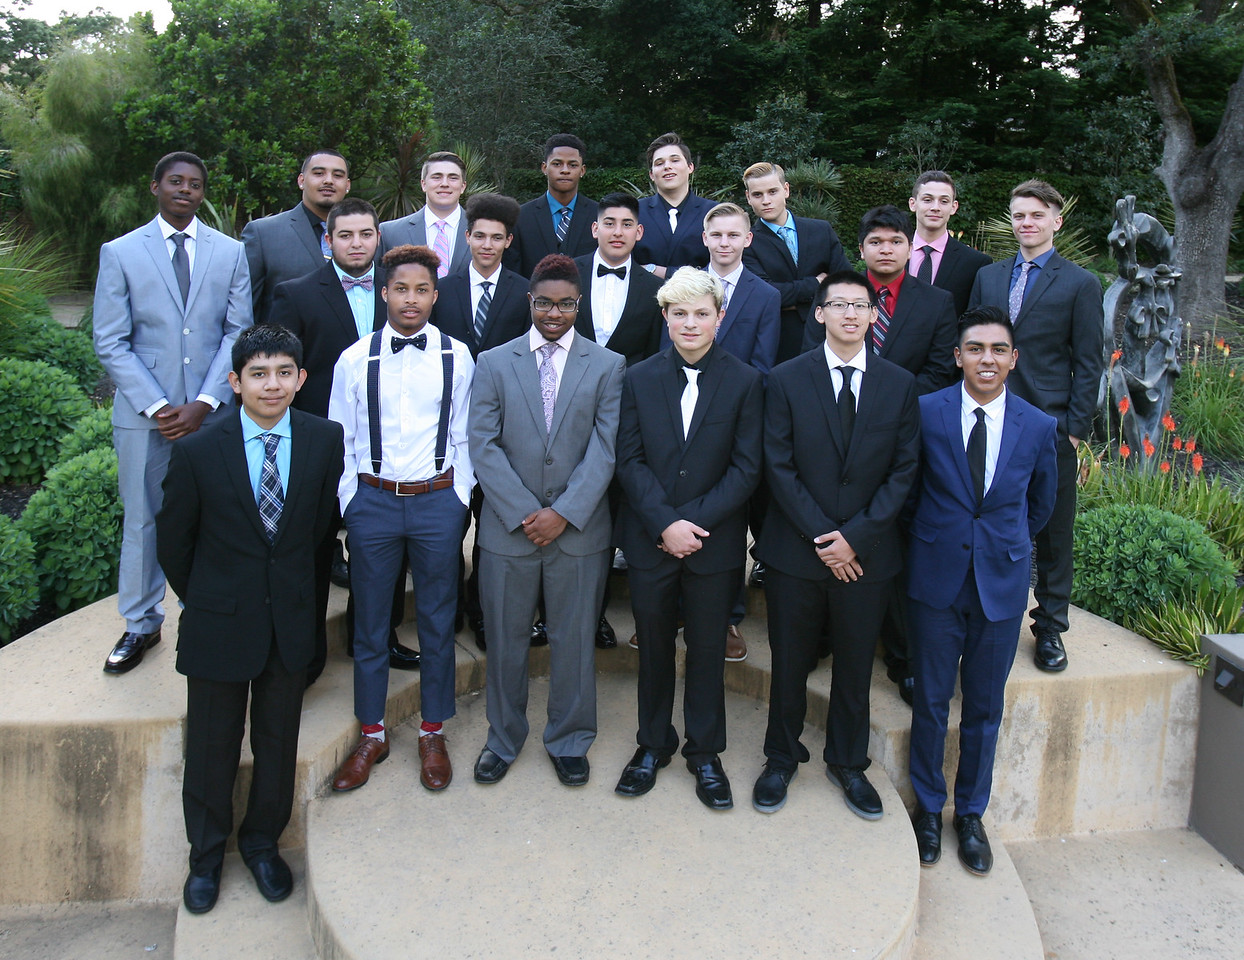 820795870ce Hanna Boys Center Celebrates 24 Graduates from Archbishop Hanna High School  Class of 2017